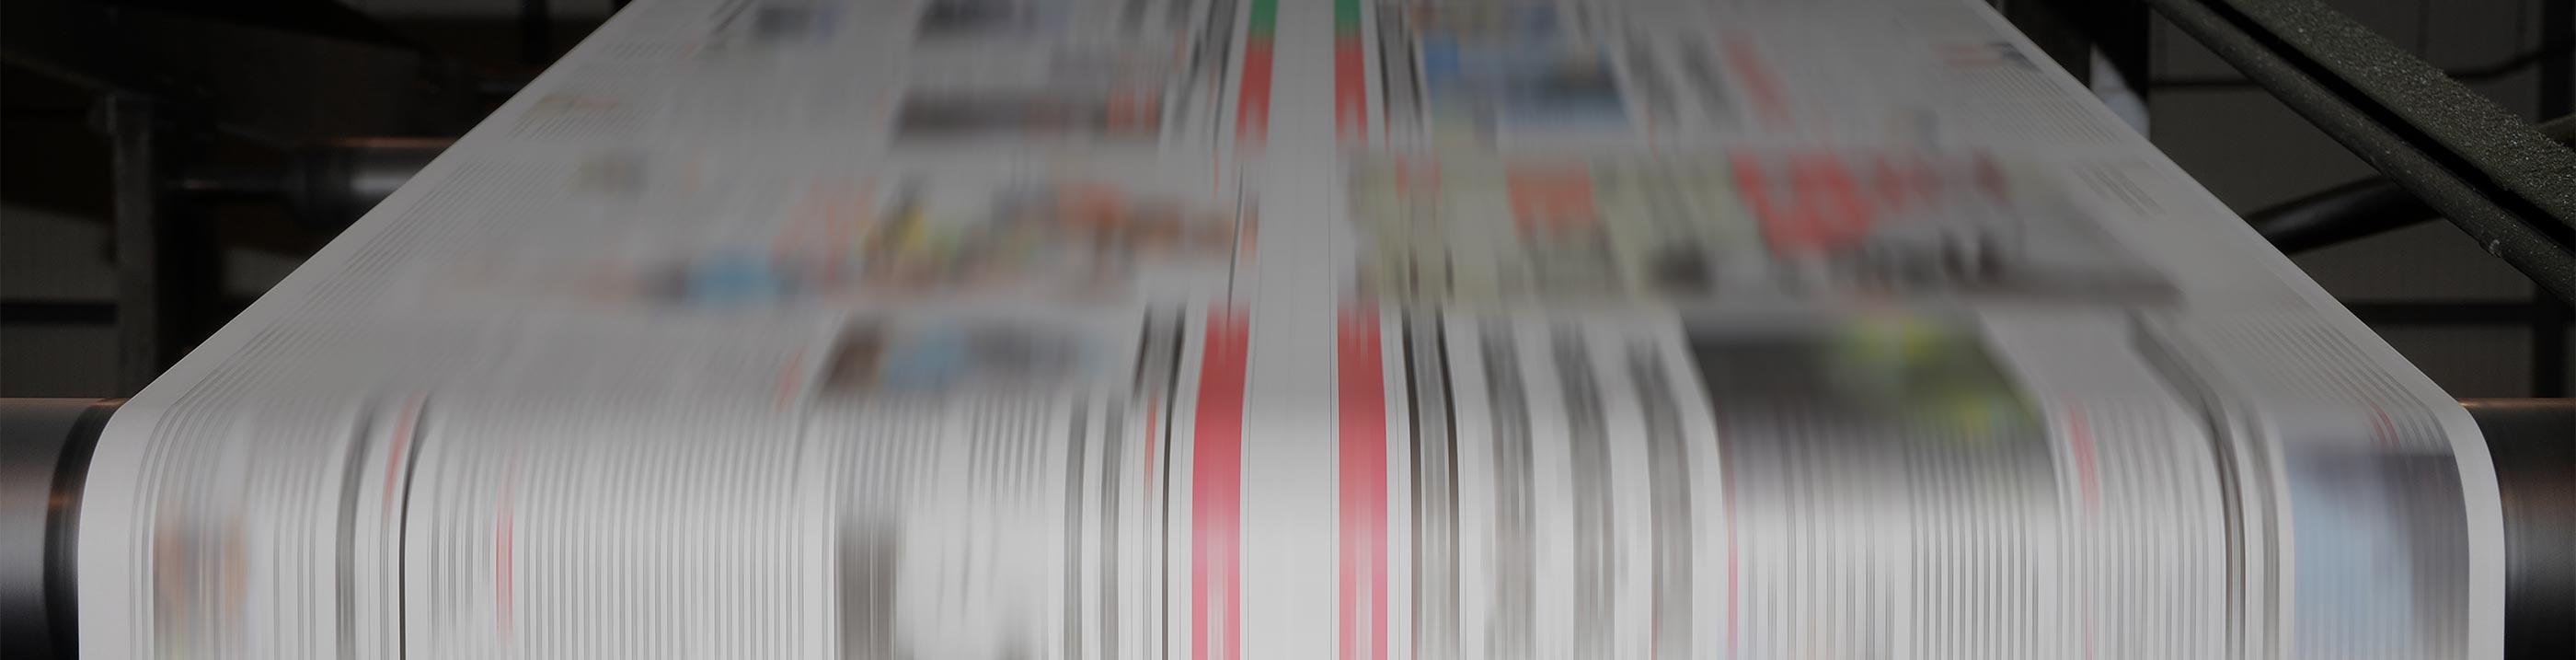 Pre-Press – Getting Ready to Print